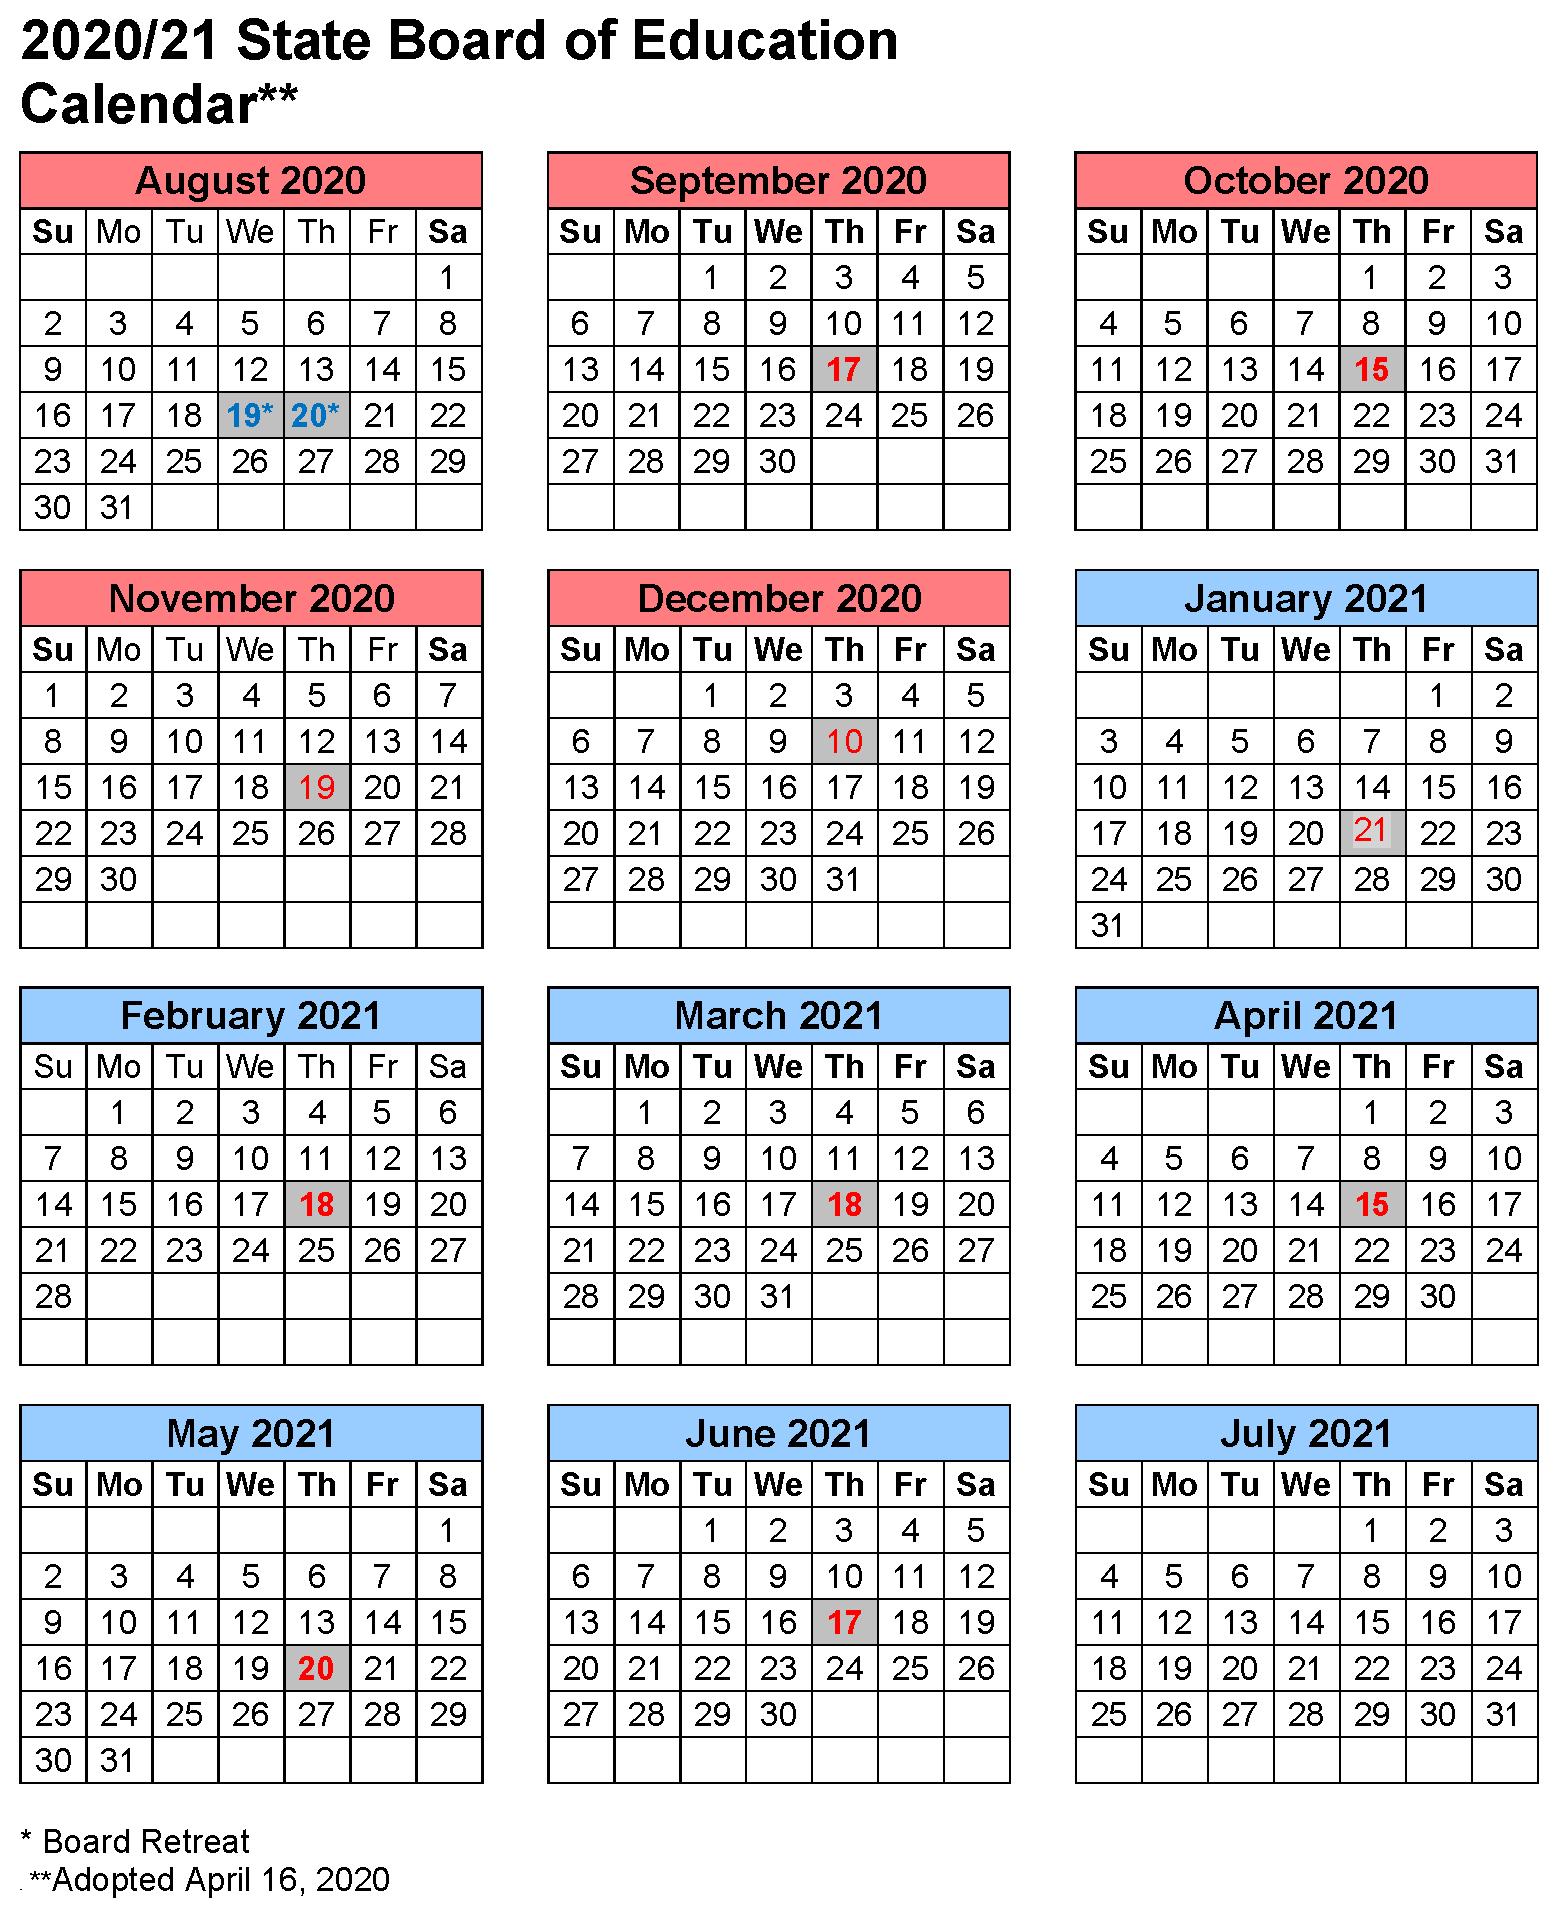 Board Of Education Calendar 2021 Oregon Department of Education : State Board Meetings : State